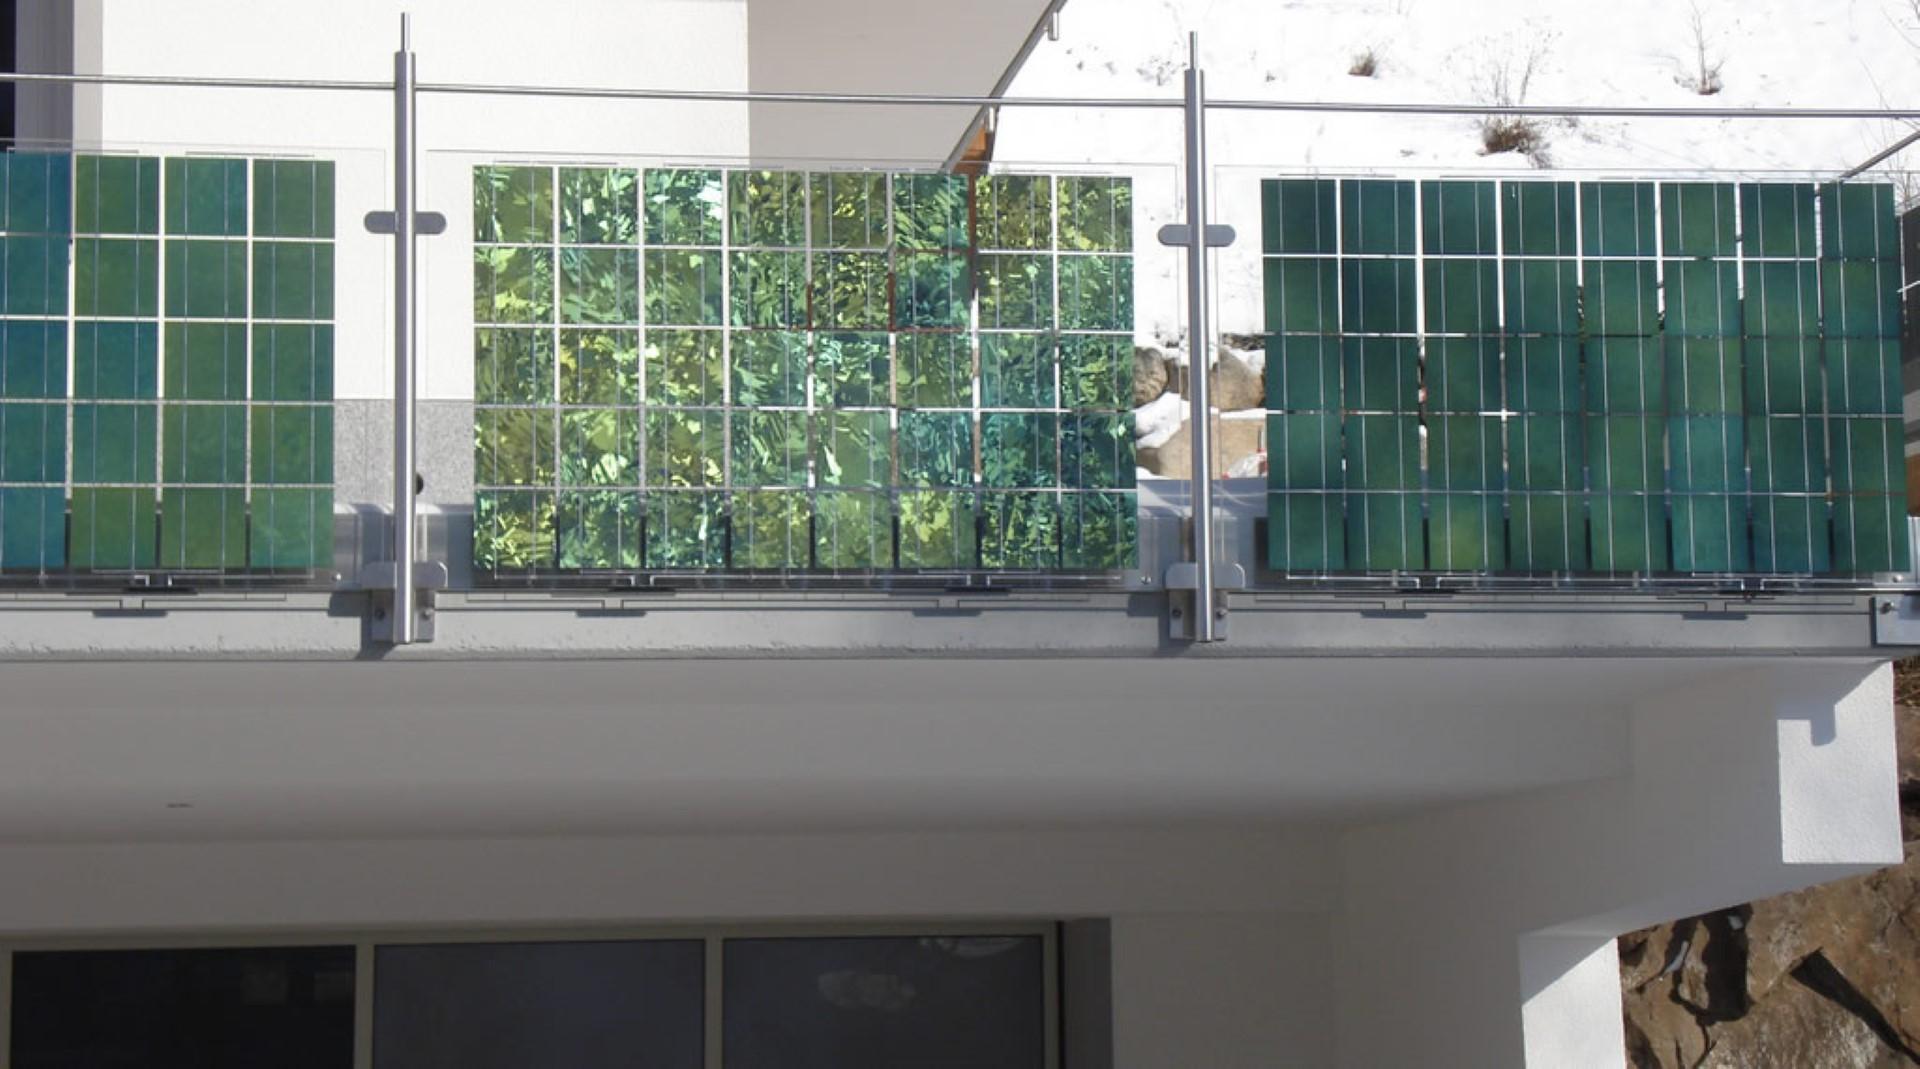 https://solarinnova.pl/wp-content/uploads/2020/03/balkony-fotowoltaiczne-12.jpg